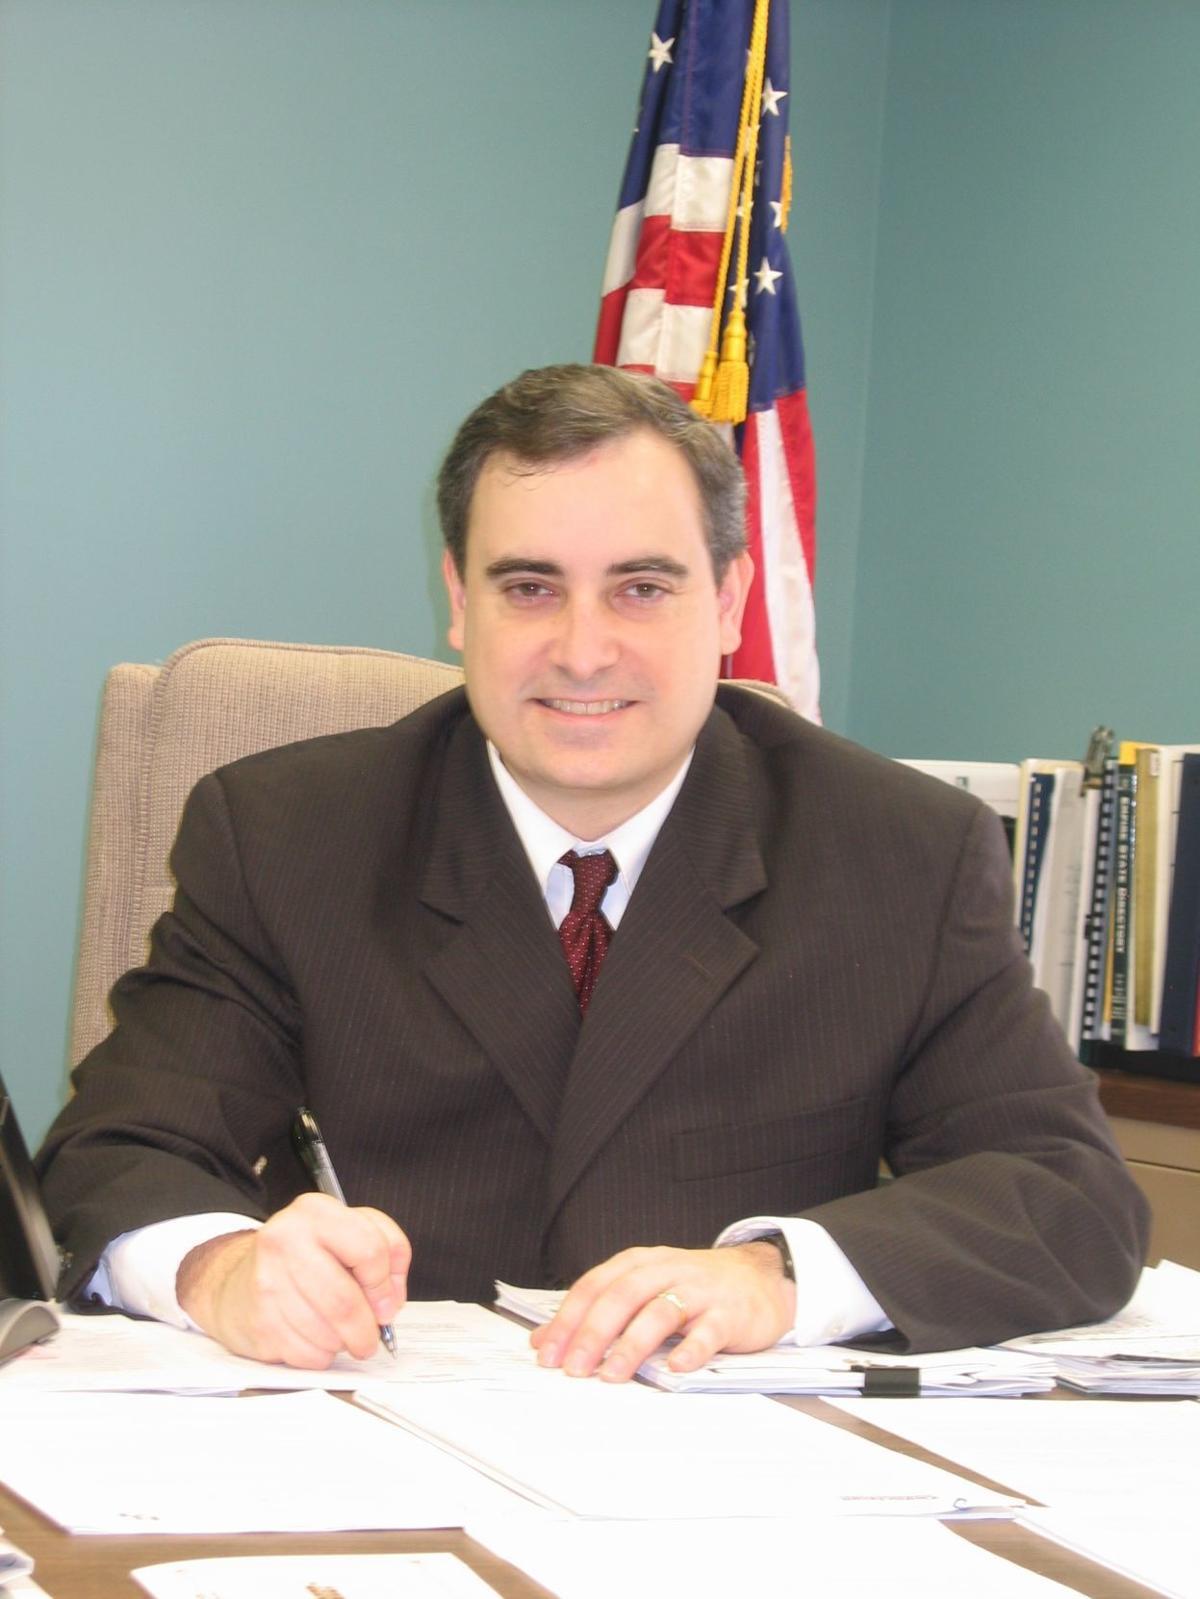 Michael Plochocki